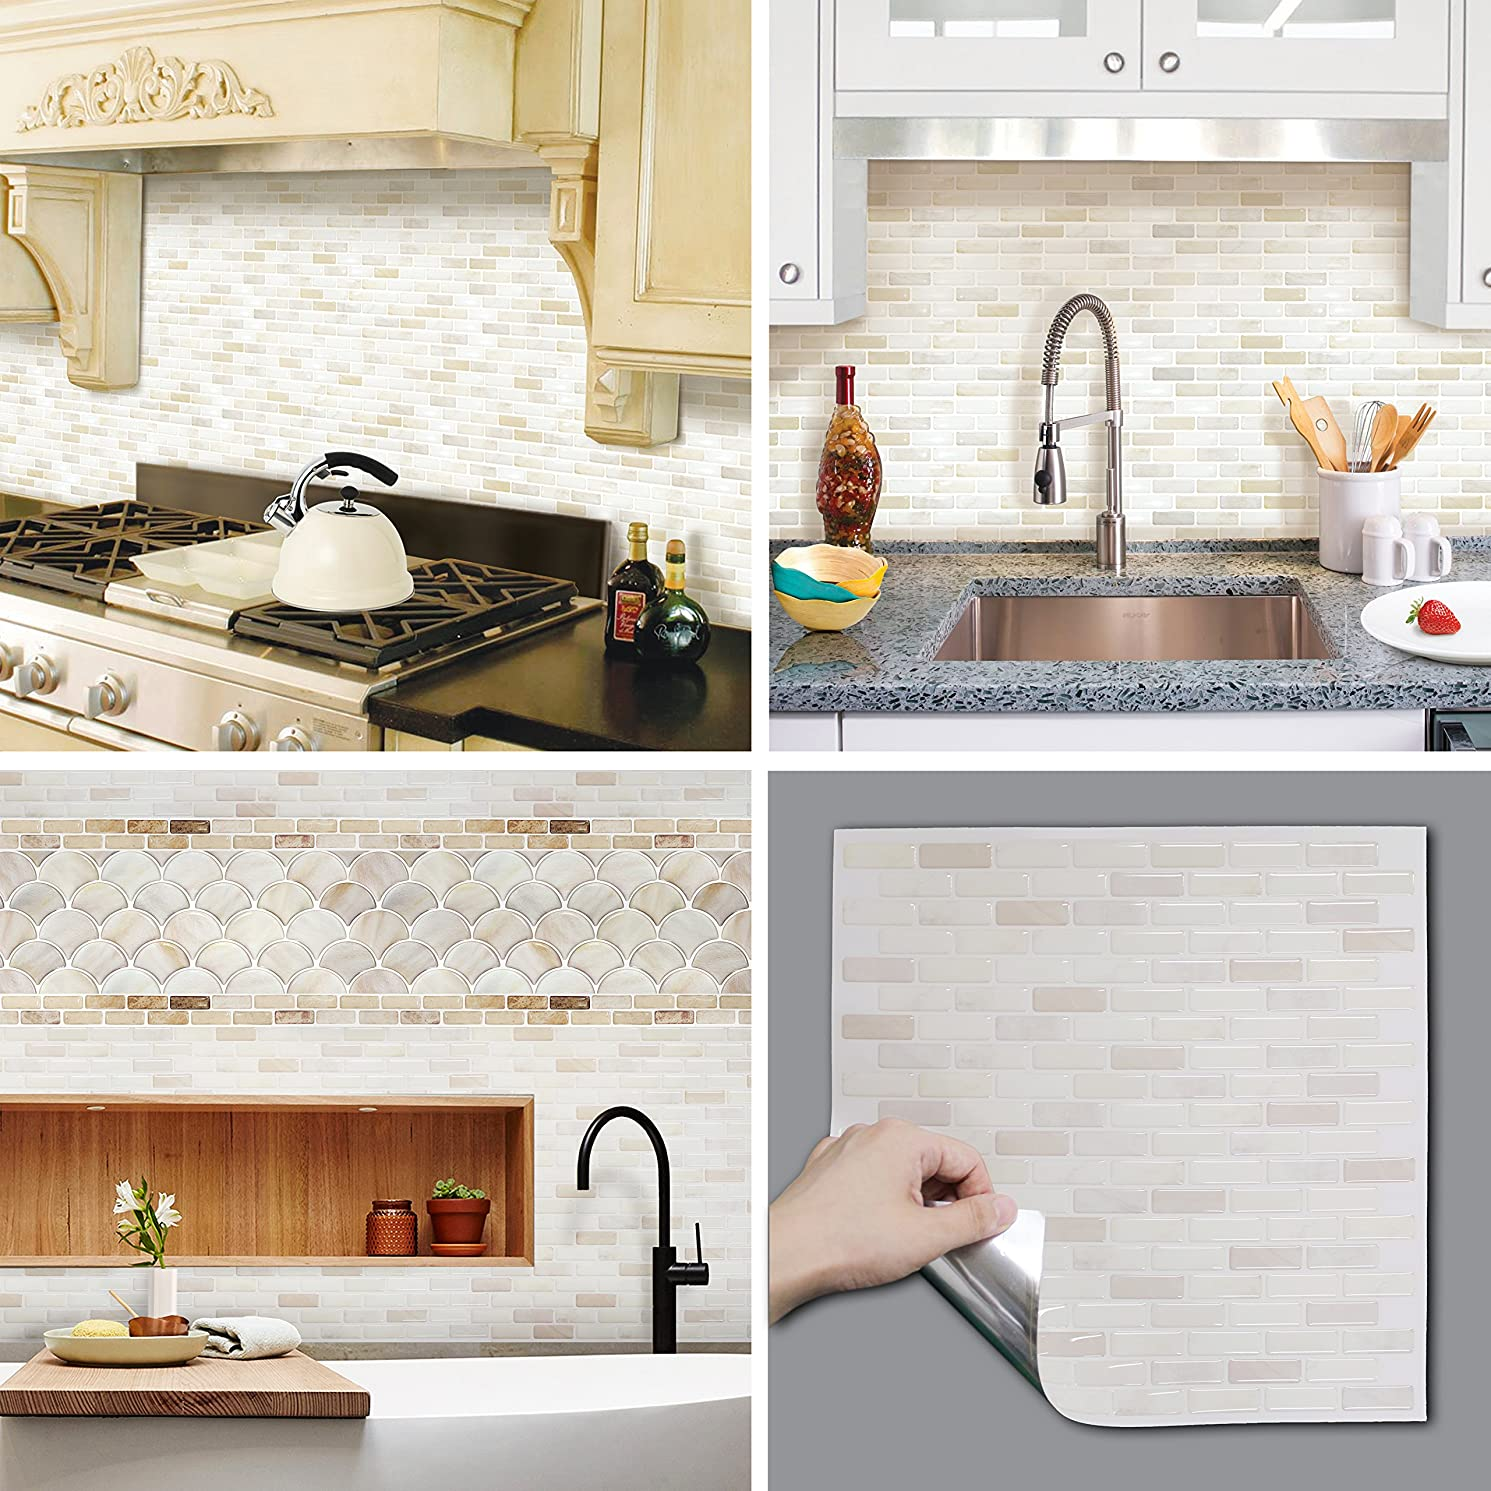 BEAUS TILE Decorative Tile Stickers Peel and Stick Backsplash Fire Retardant Tile Sheet (White Brick) (2, 12.2